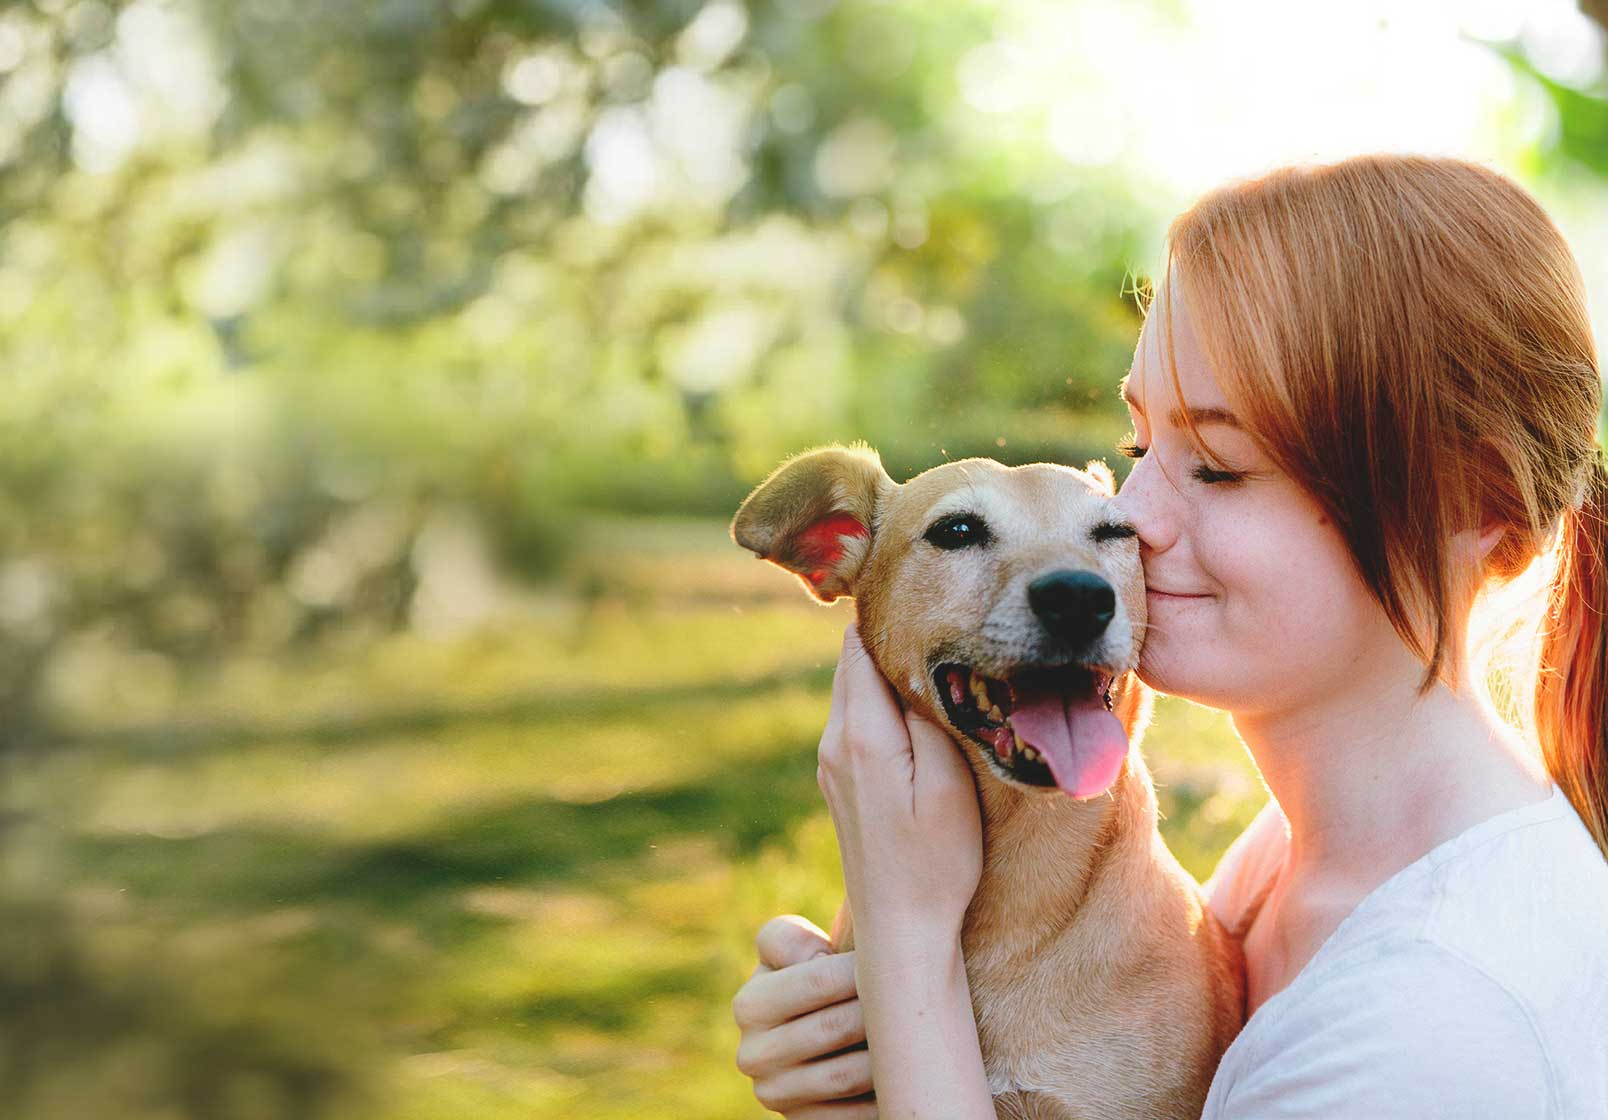 Deciding on Pet Care Pet Insurance